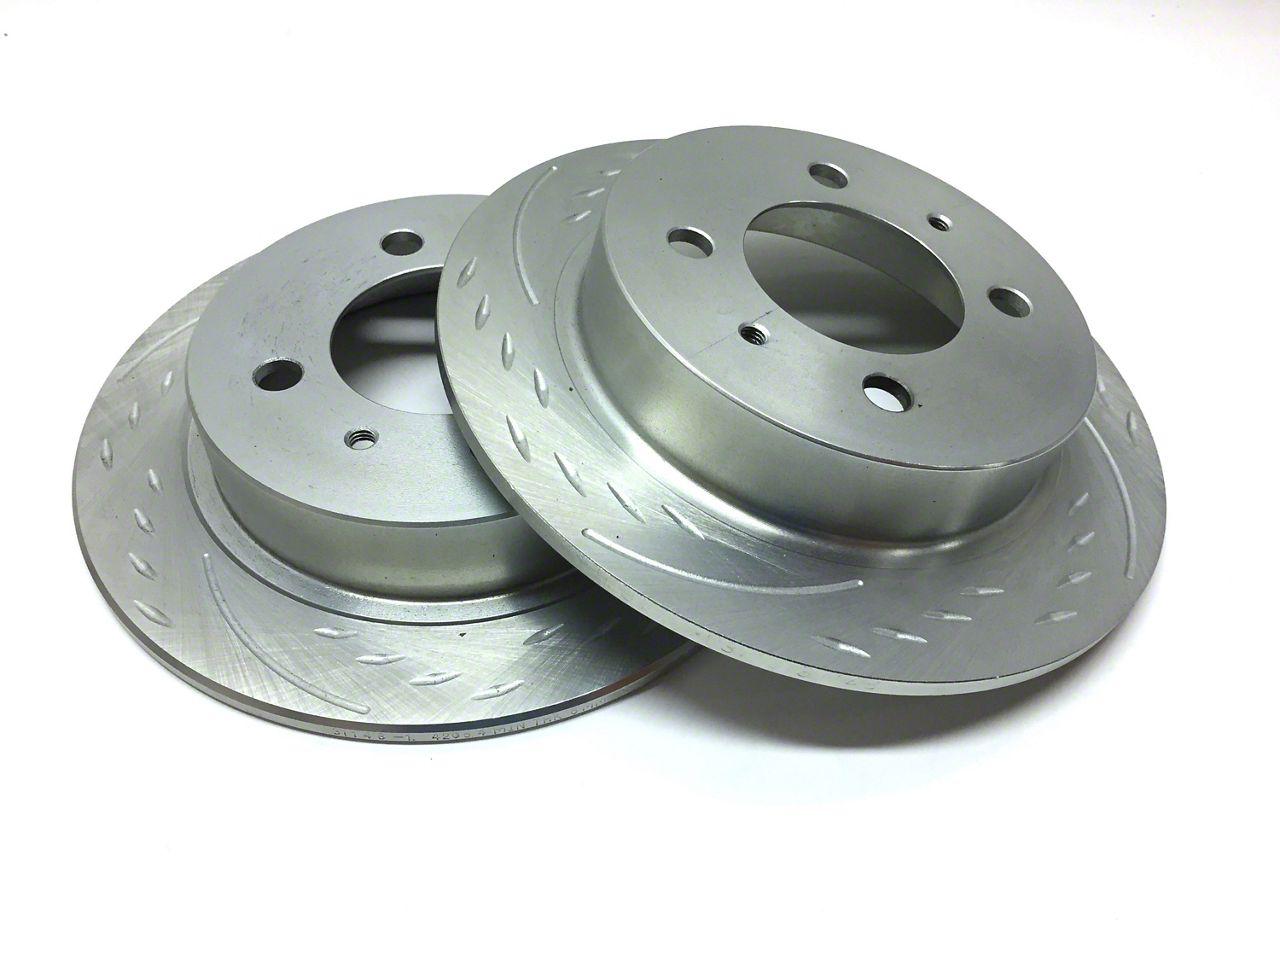 SP Performance Diamond Slot Rotors w/ Silver Zinc Plating - Rear Pair (04-14 F-150; 15-18 F-150 w/ Manual Parking Brake)